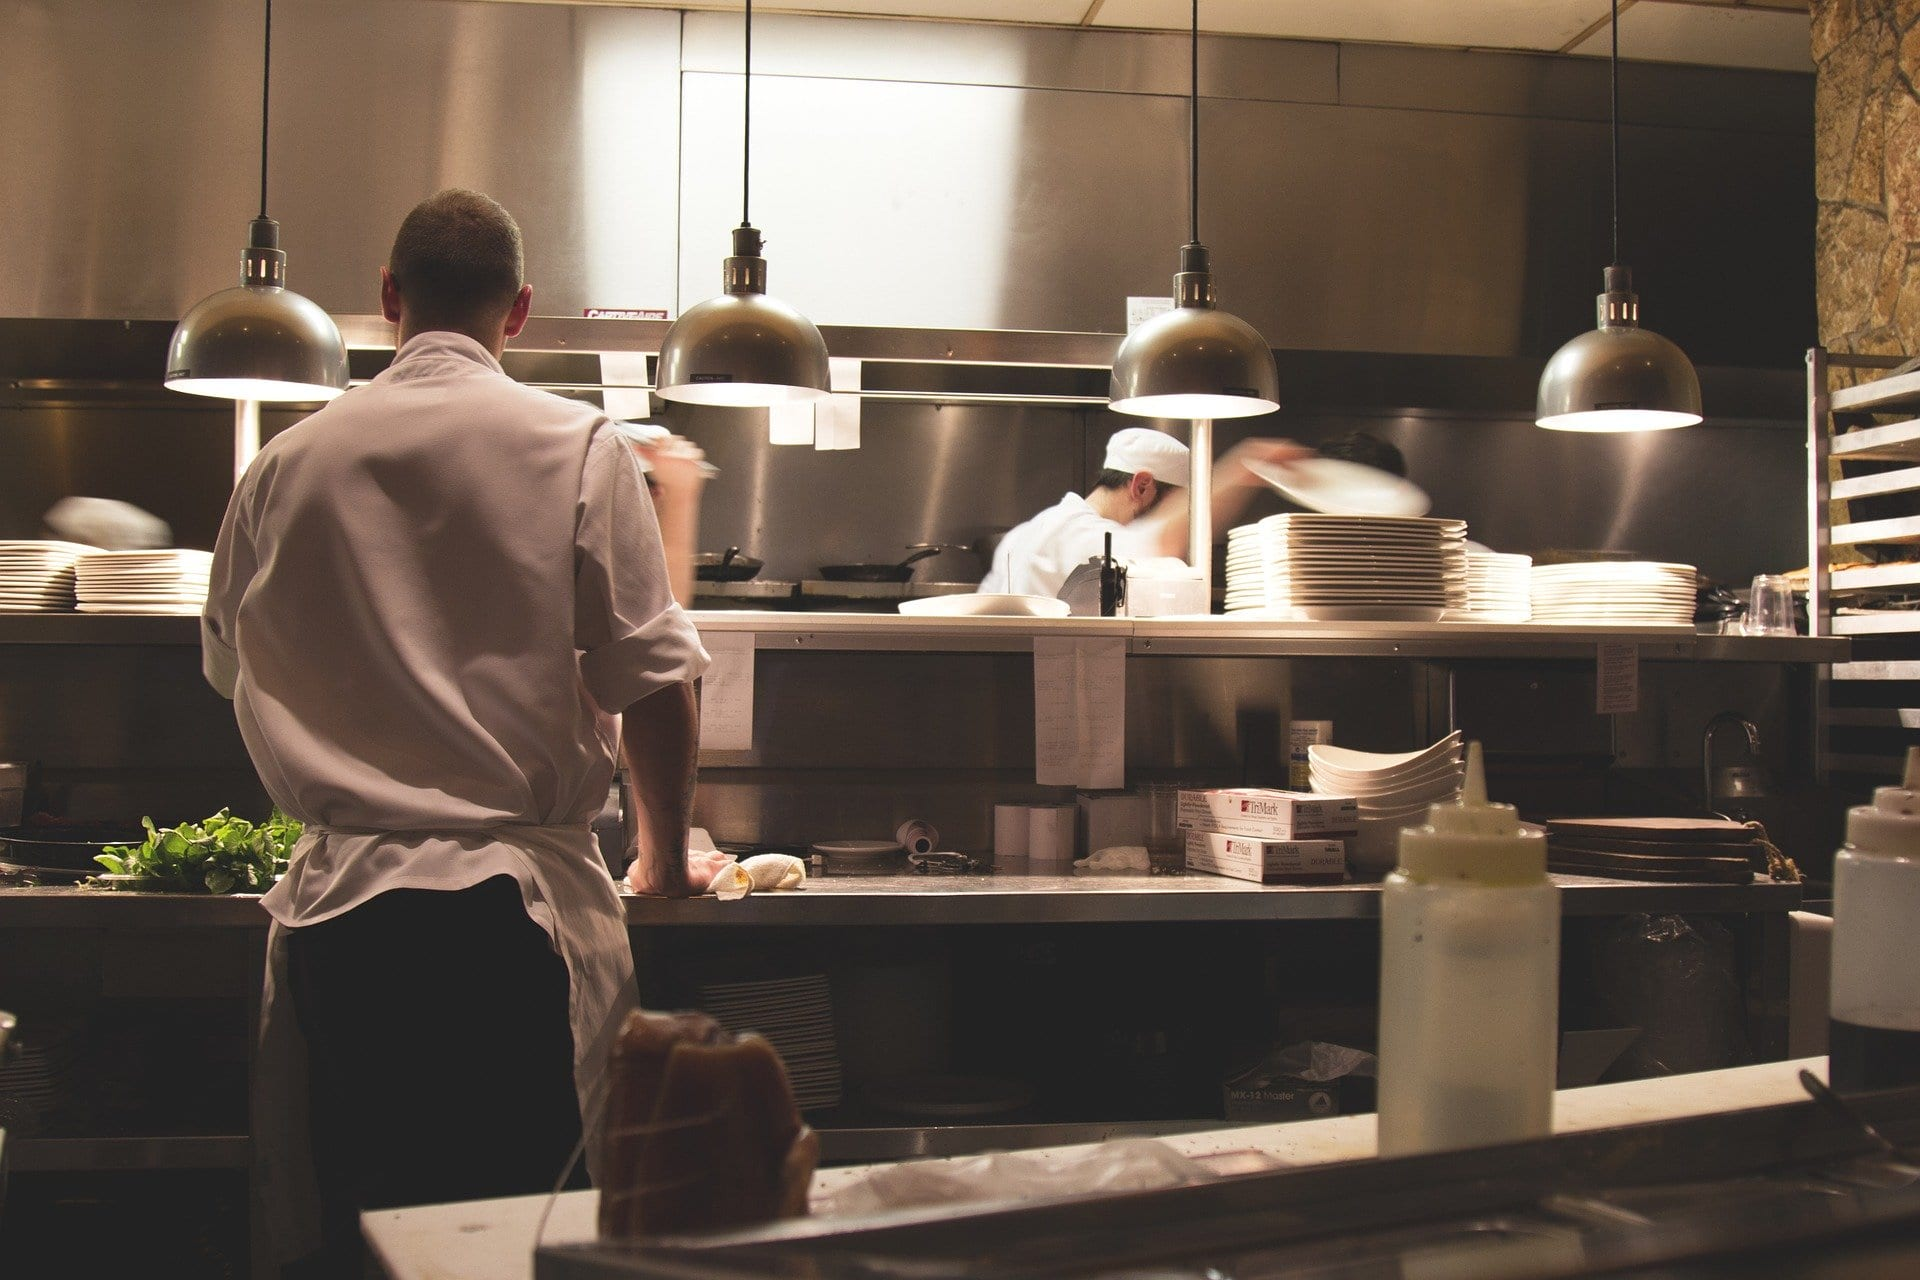 Lavoro in cucina